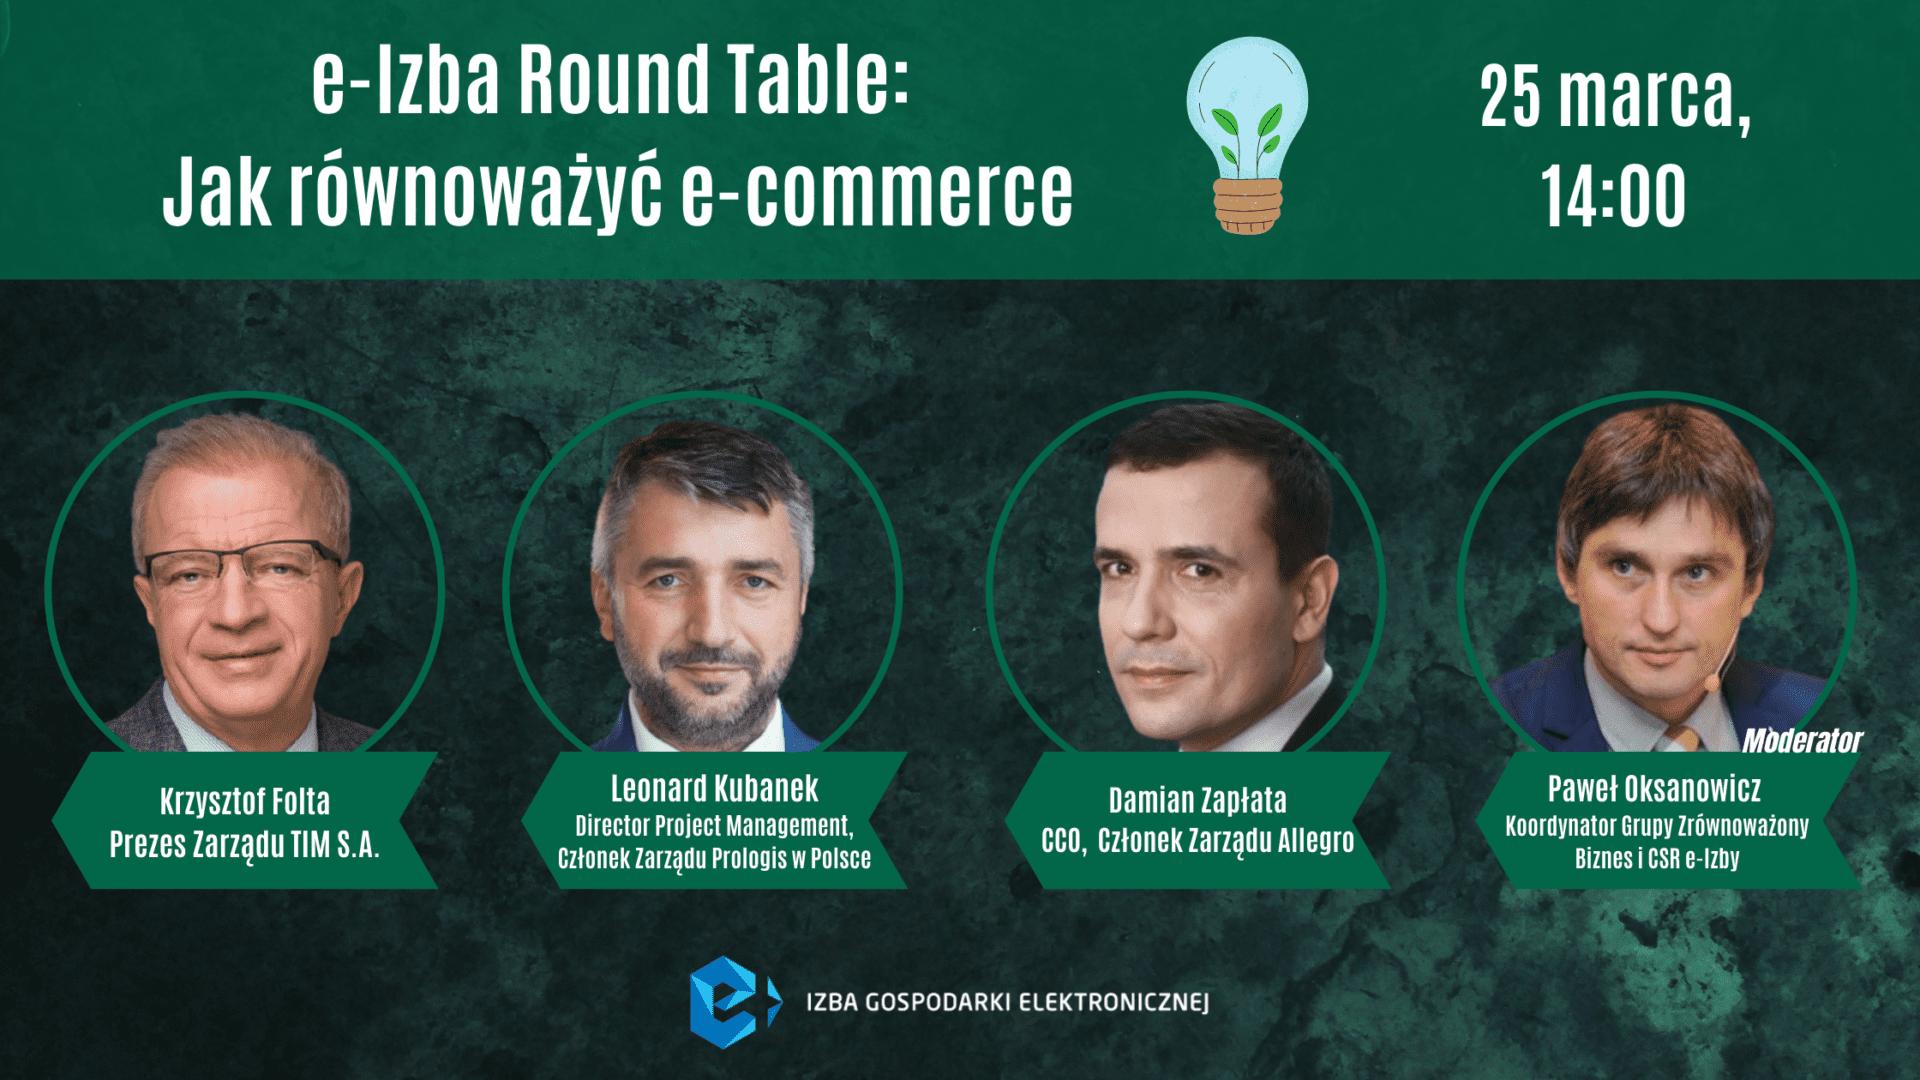 e-Izba Round Table: Jak równoważyć e-commerce?